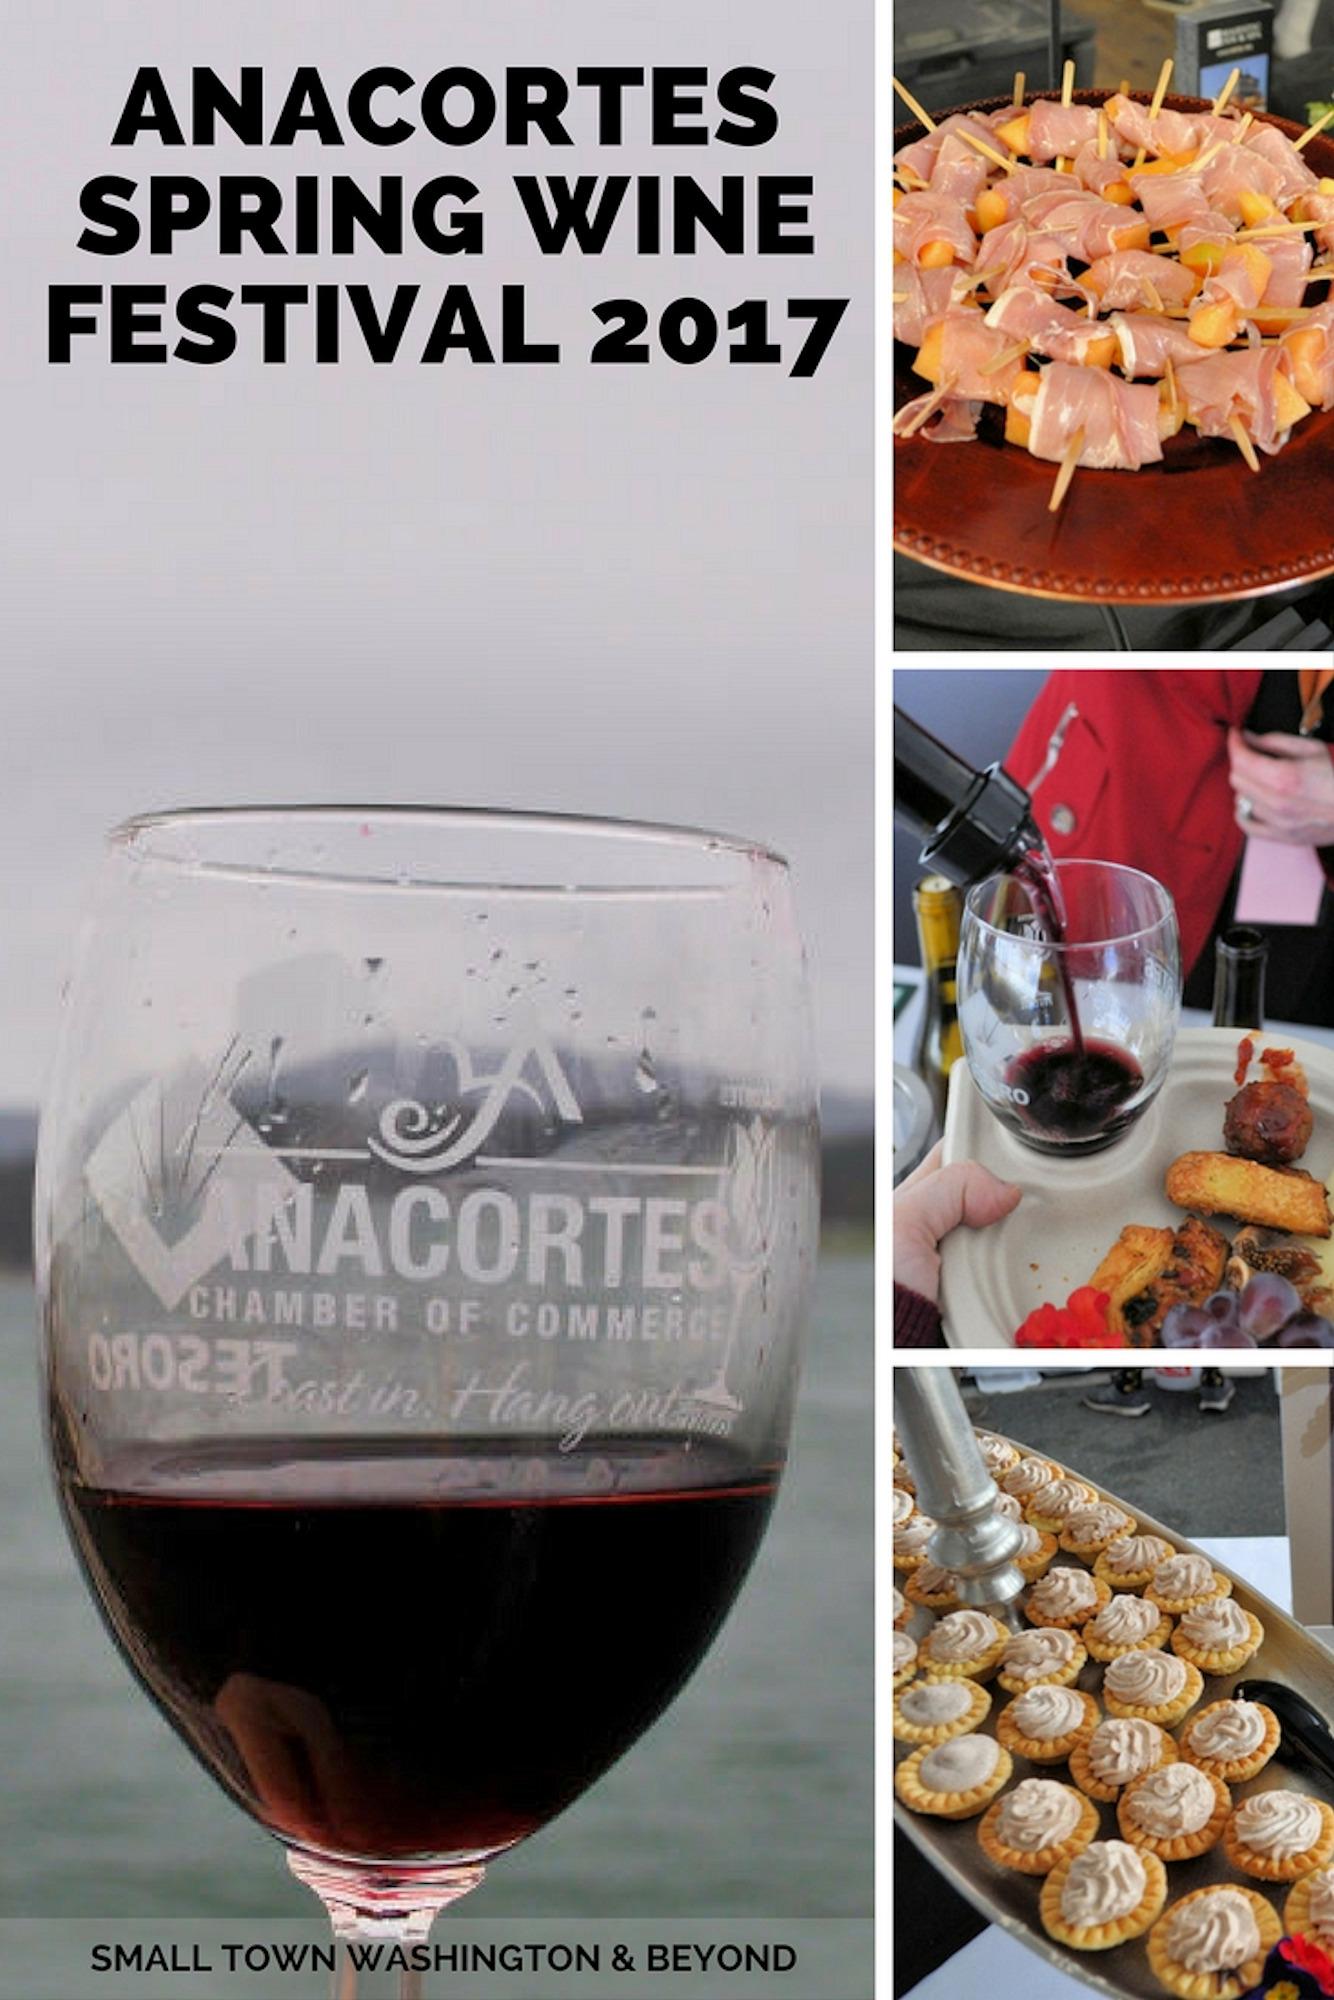 Anacortes Spring Wine Festival 2017